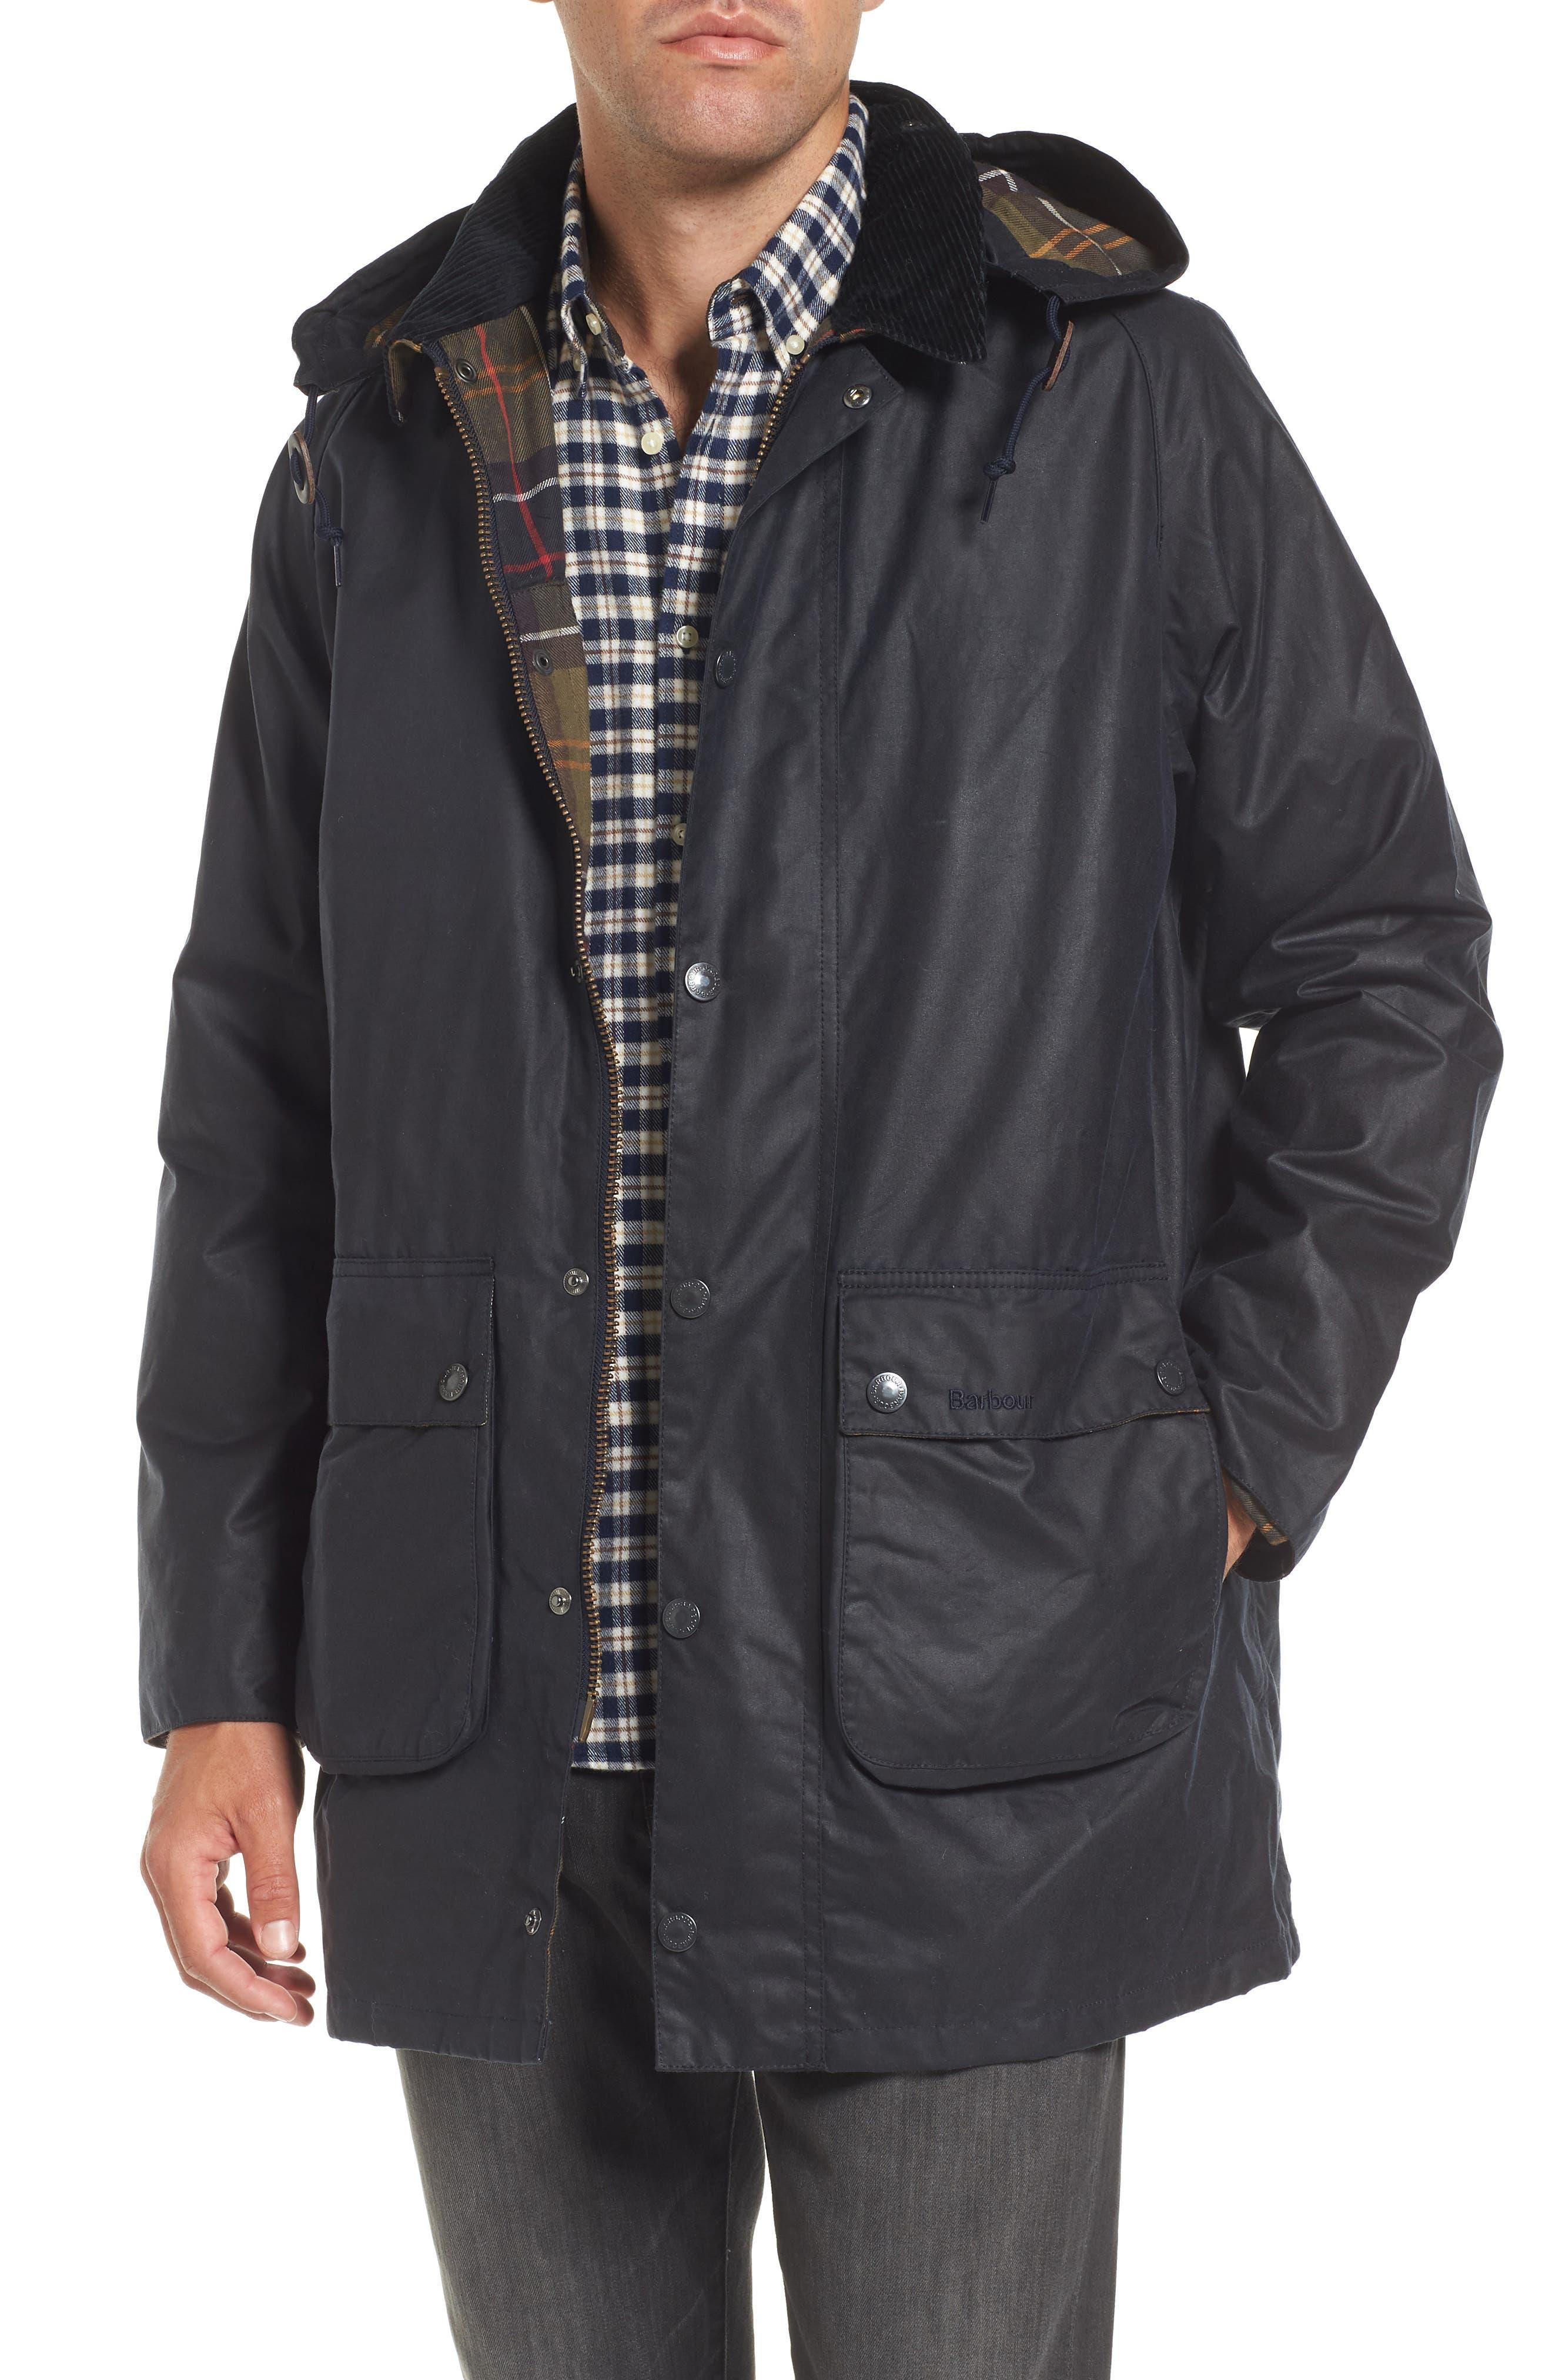 Main Image - Barbour Leighton Waxed Cotton Jacket